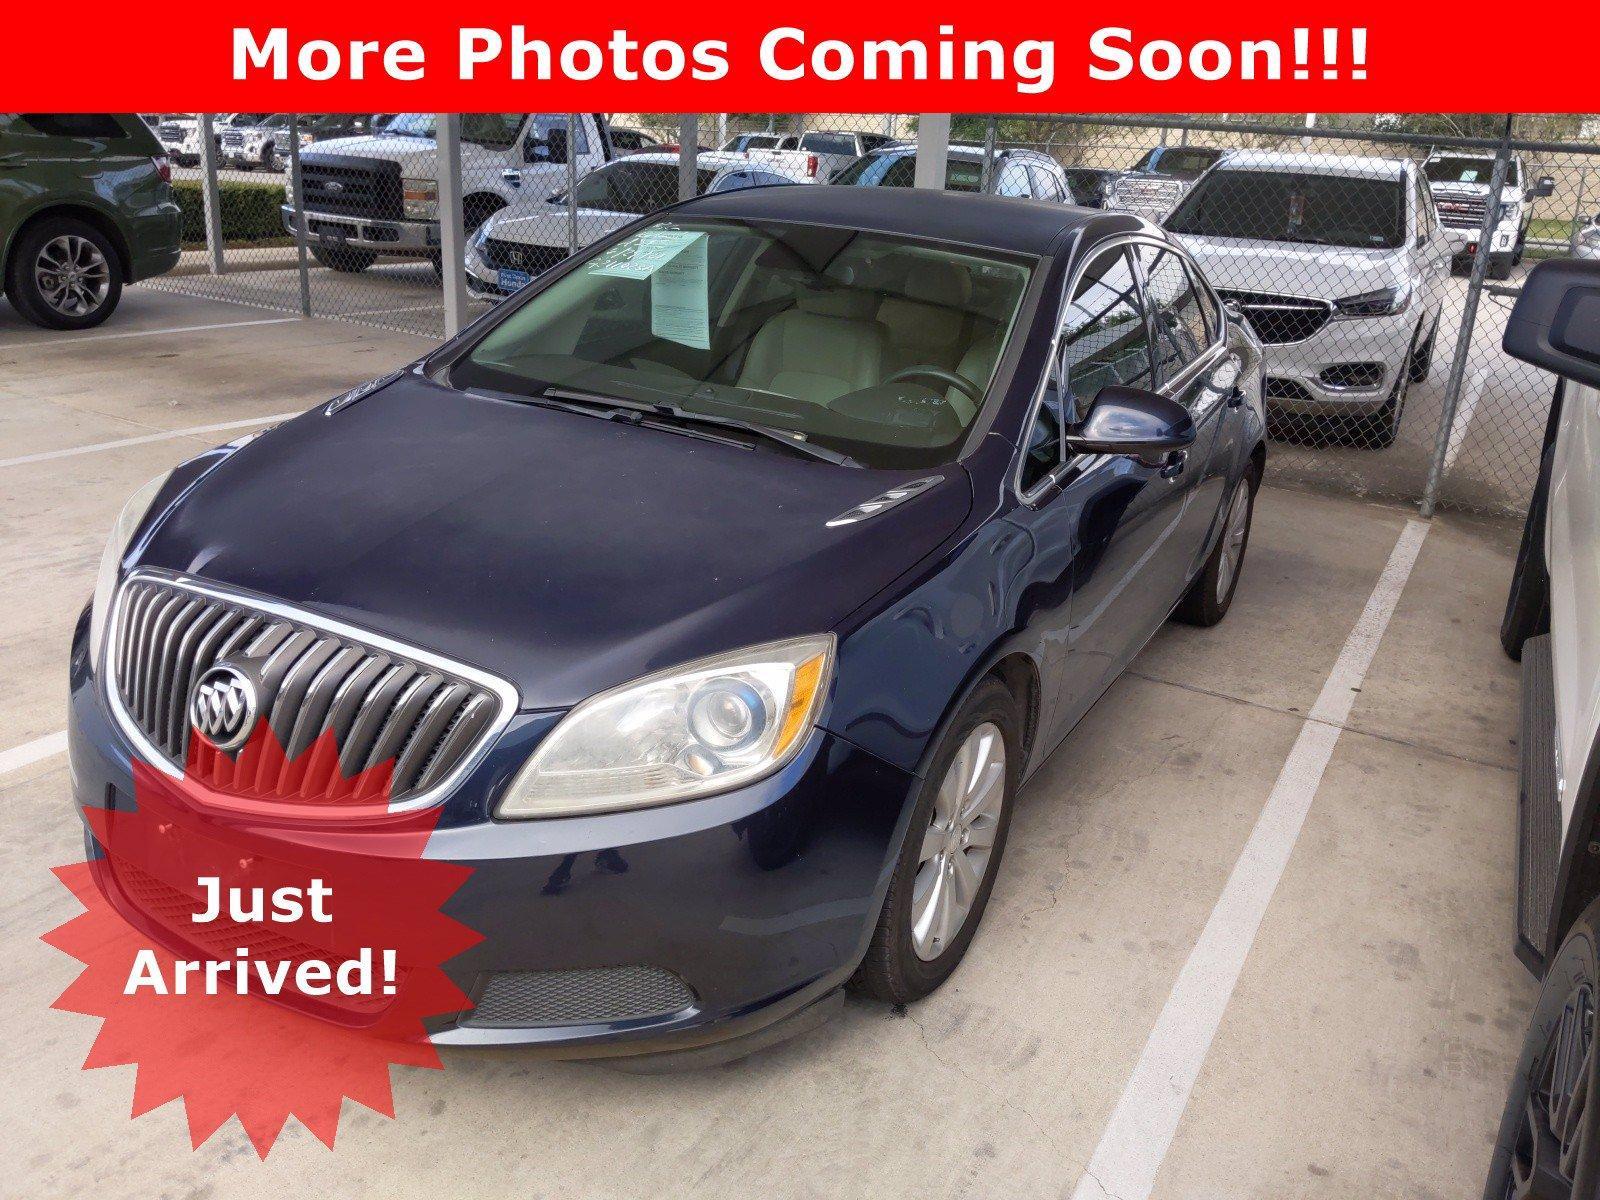 2016 Buick Verano Vehicle Photo in SELMA, TX 78154-1459